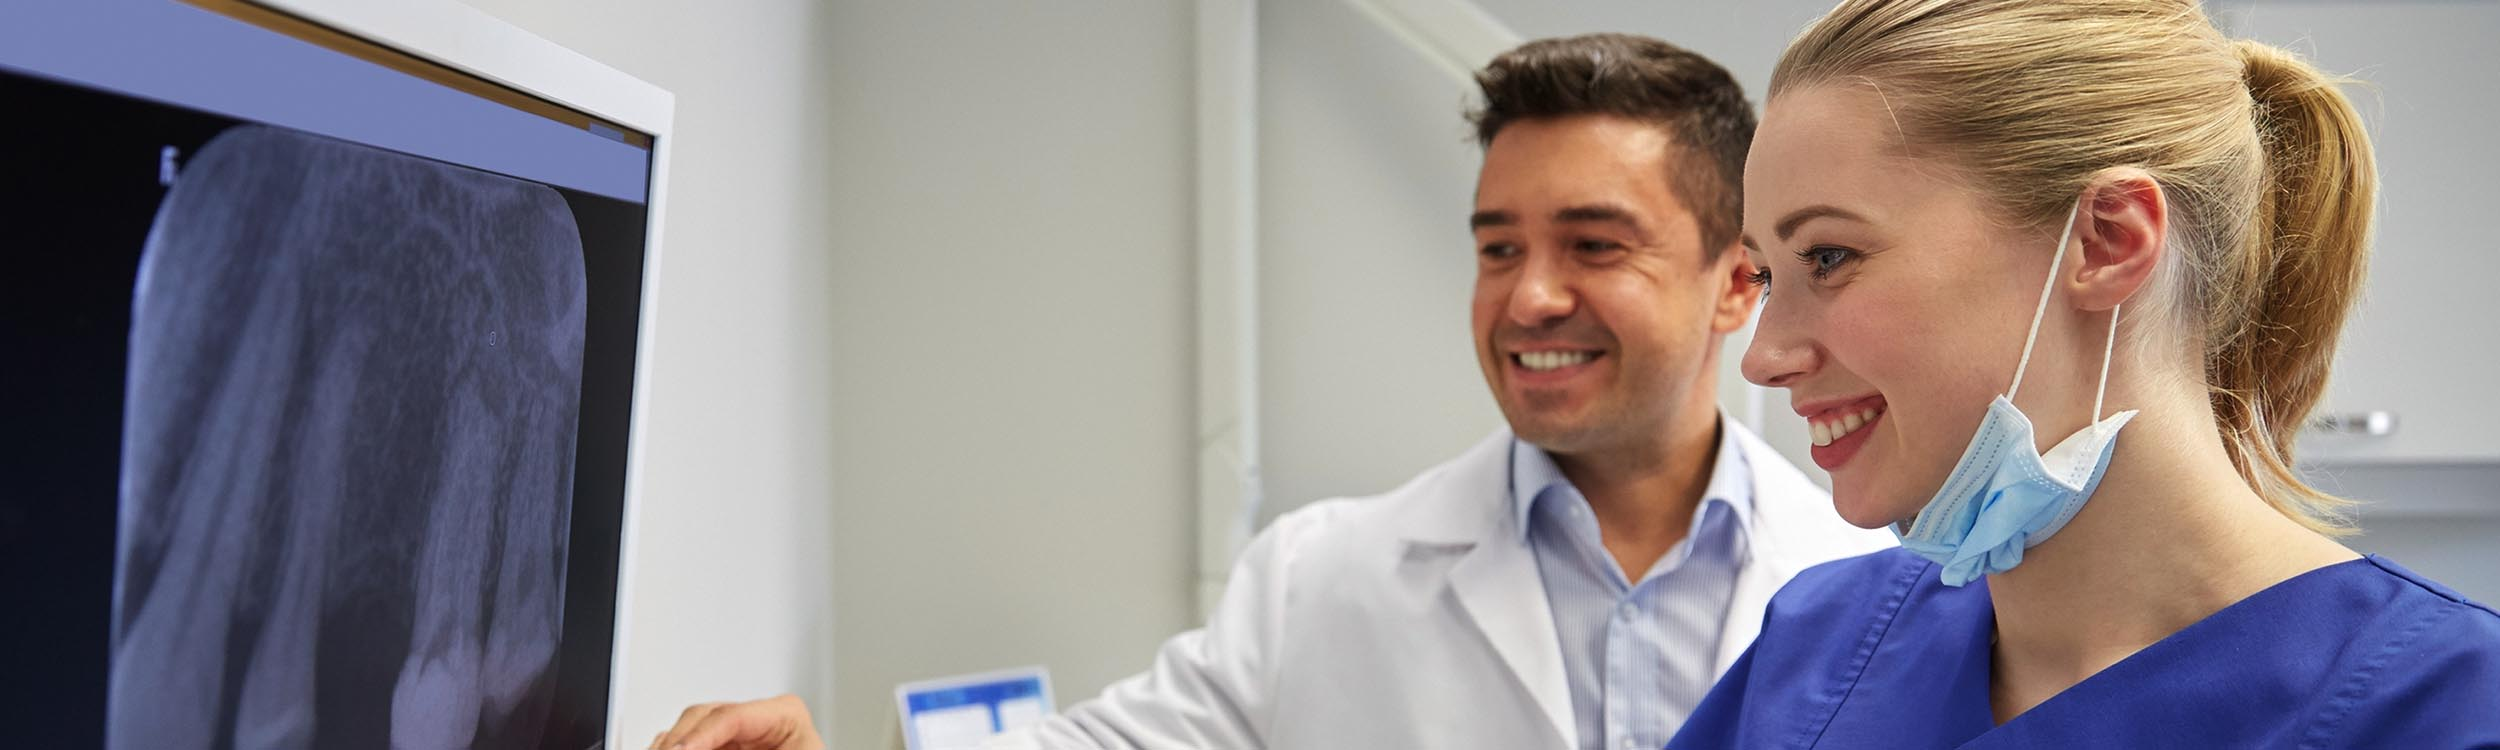 Penn Dental Medicine